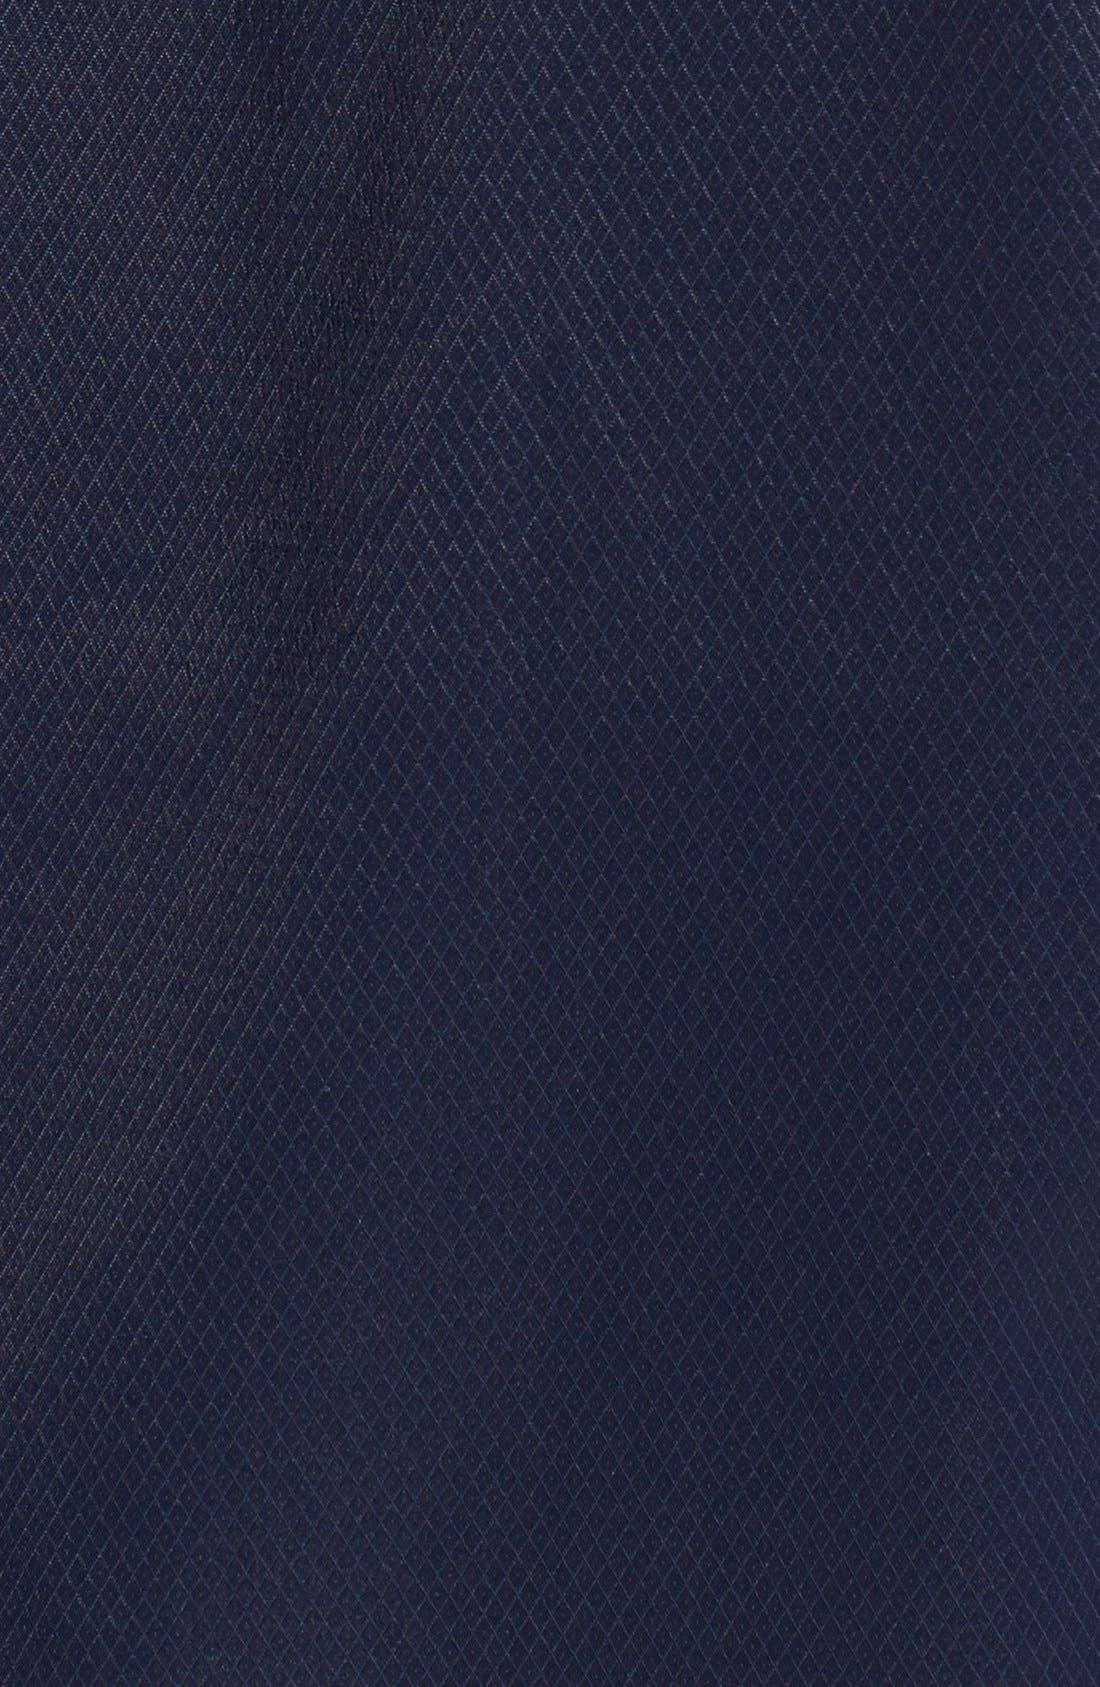 Blakely WeatherTec<sup>®</sup> Wind & Water Resistant Full Zip Jacket,                             Alternate thumbnail 2, color,                             LIBERTY NAVY